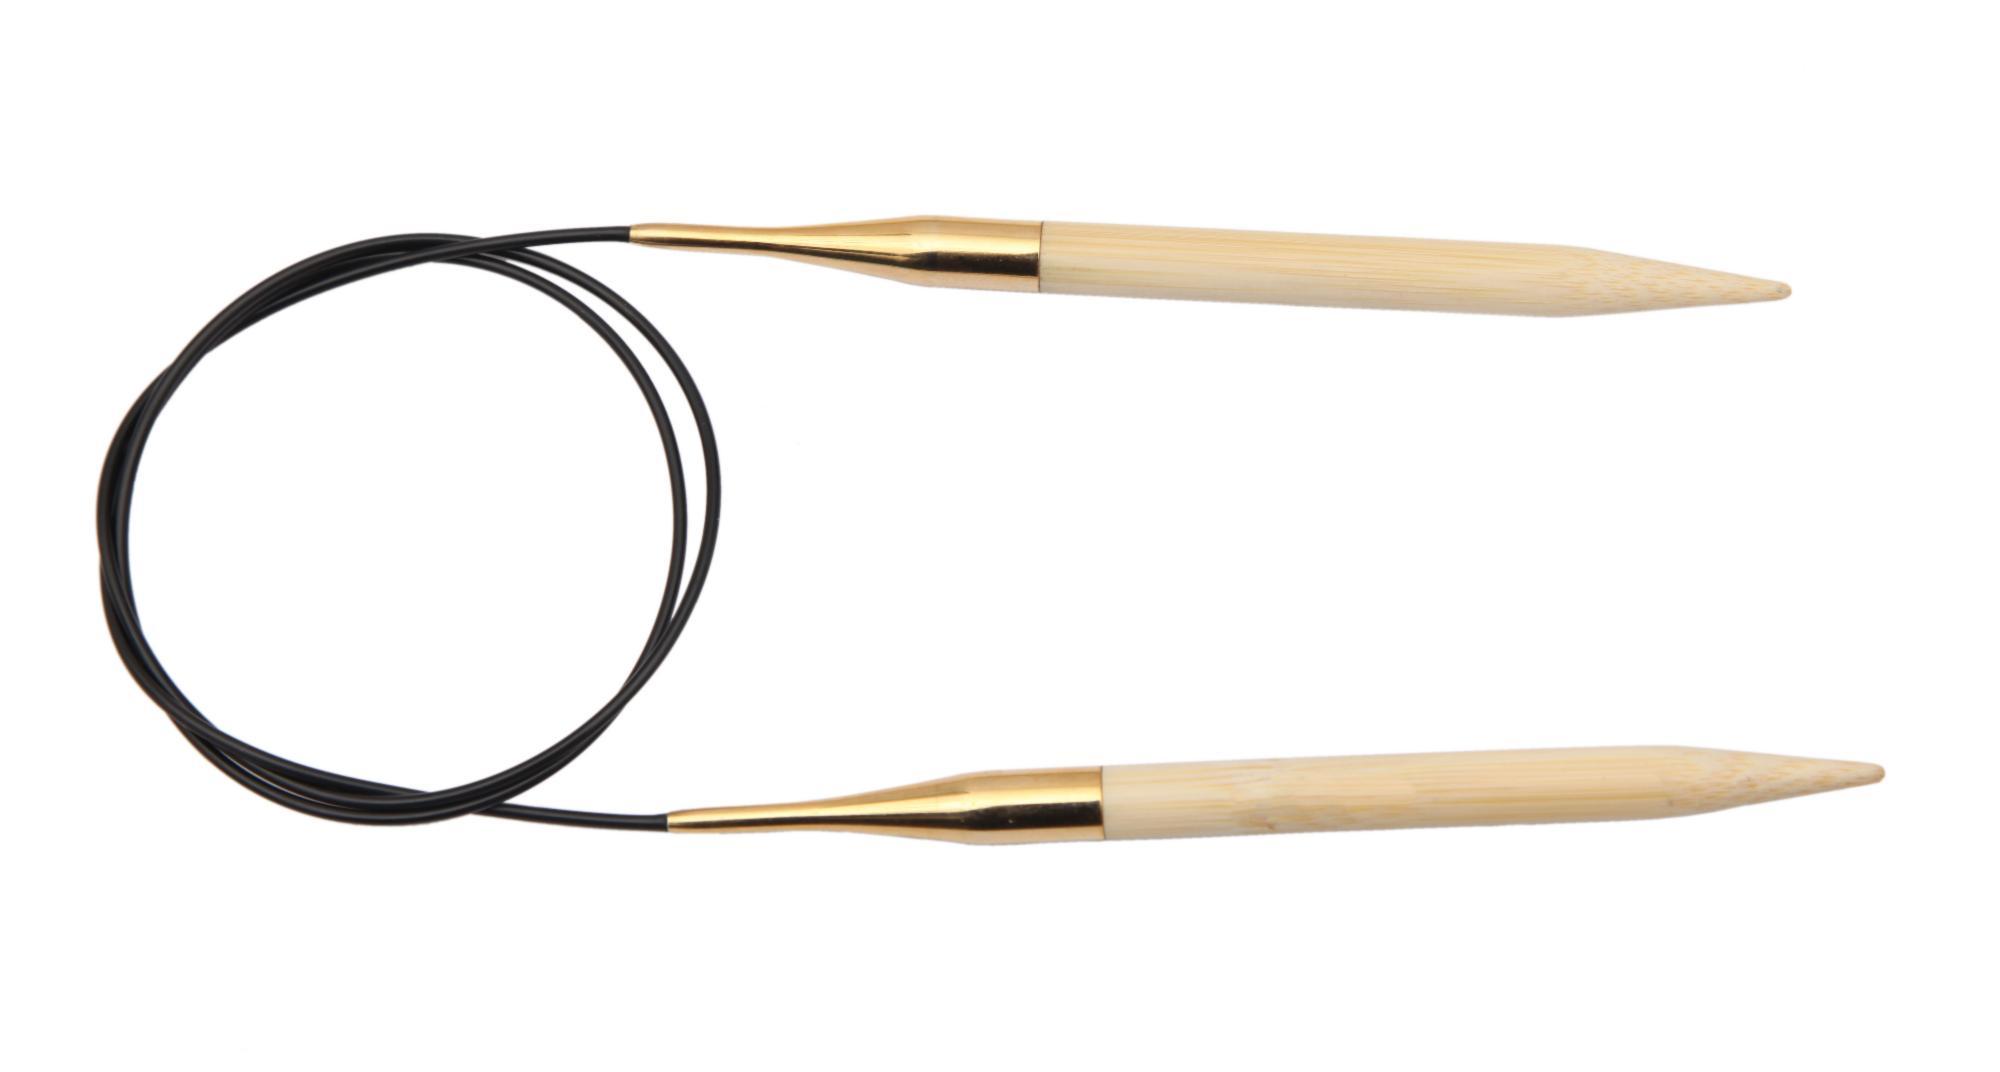 Спицы круговые 80 см Bamboo KnitPro, 22253, 7.00 мм